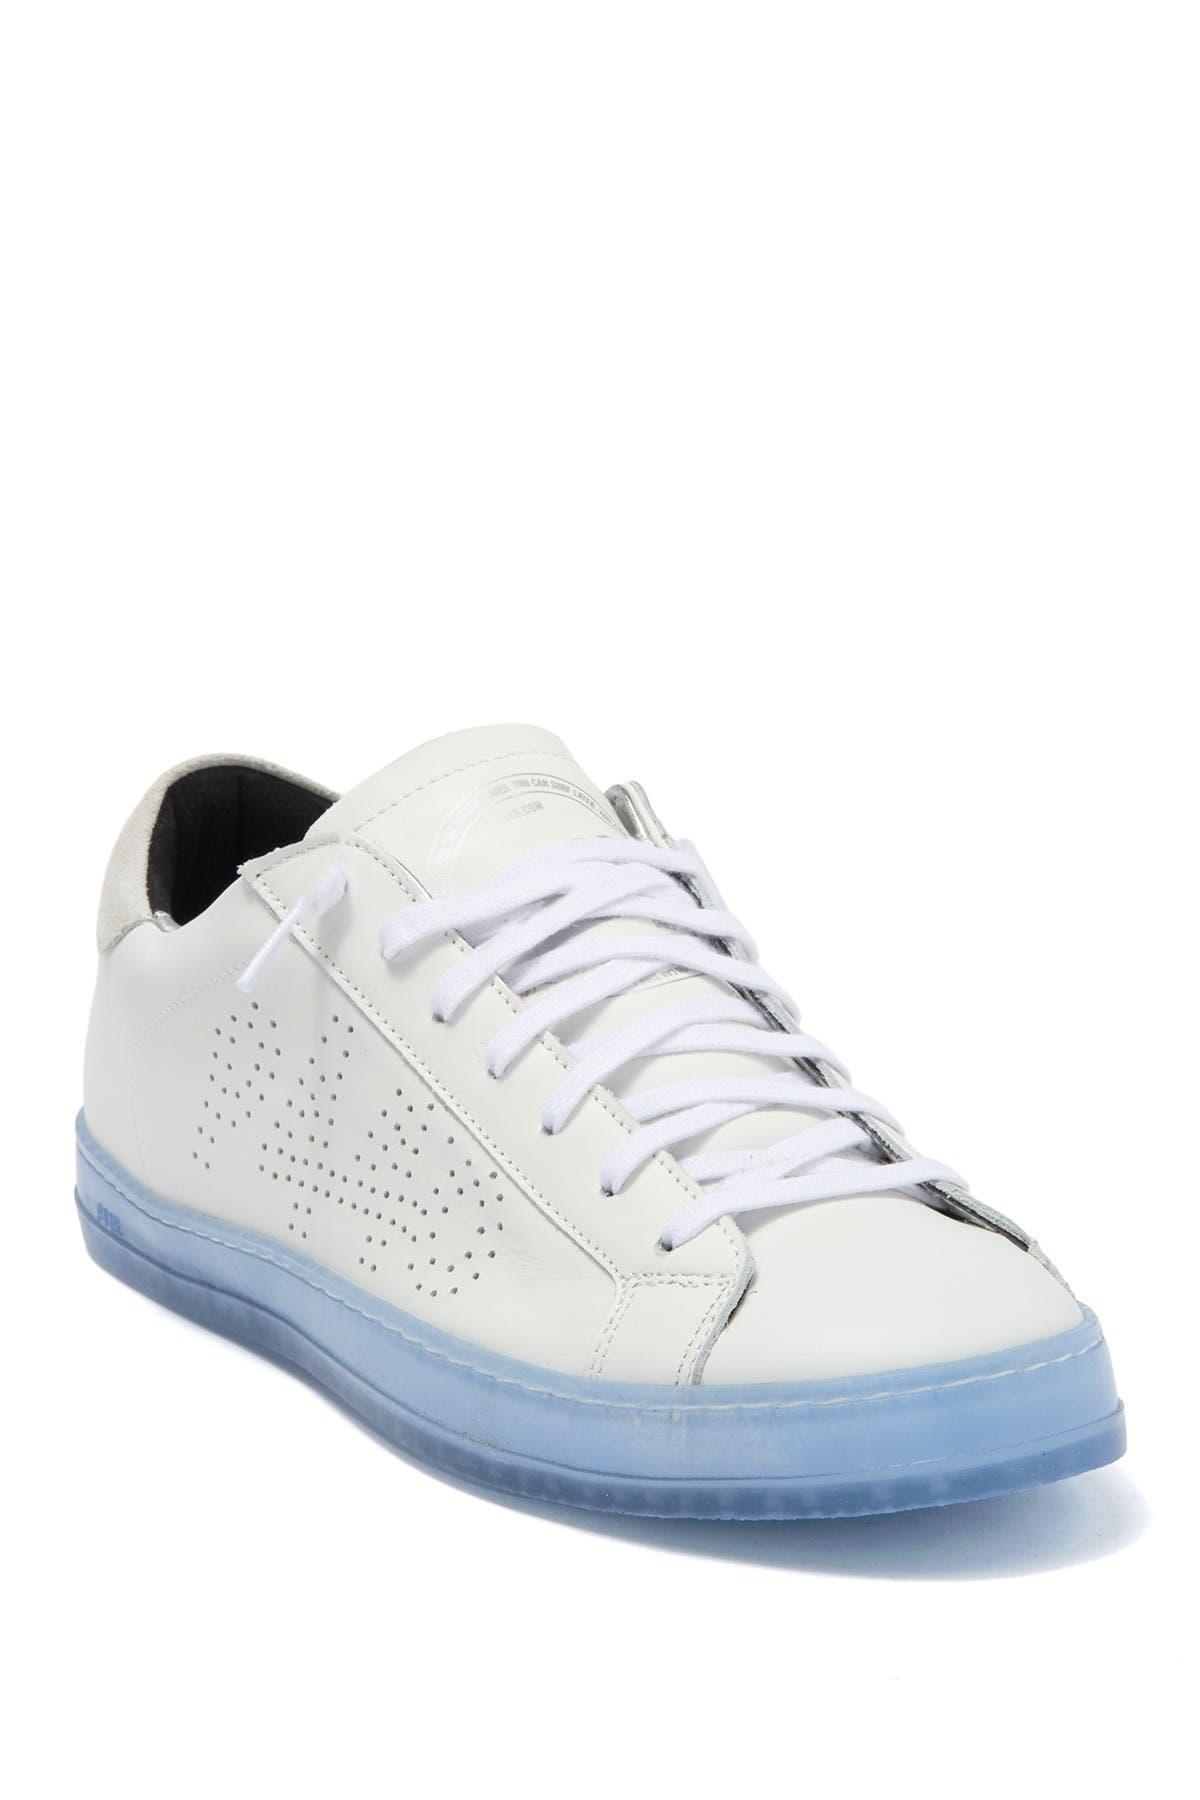 Image of P448 S20 John Sneaker